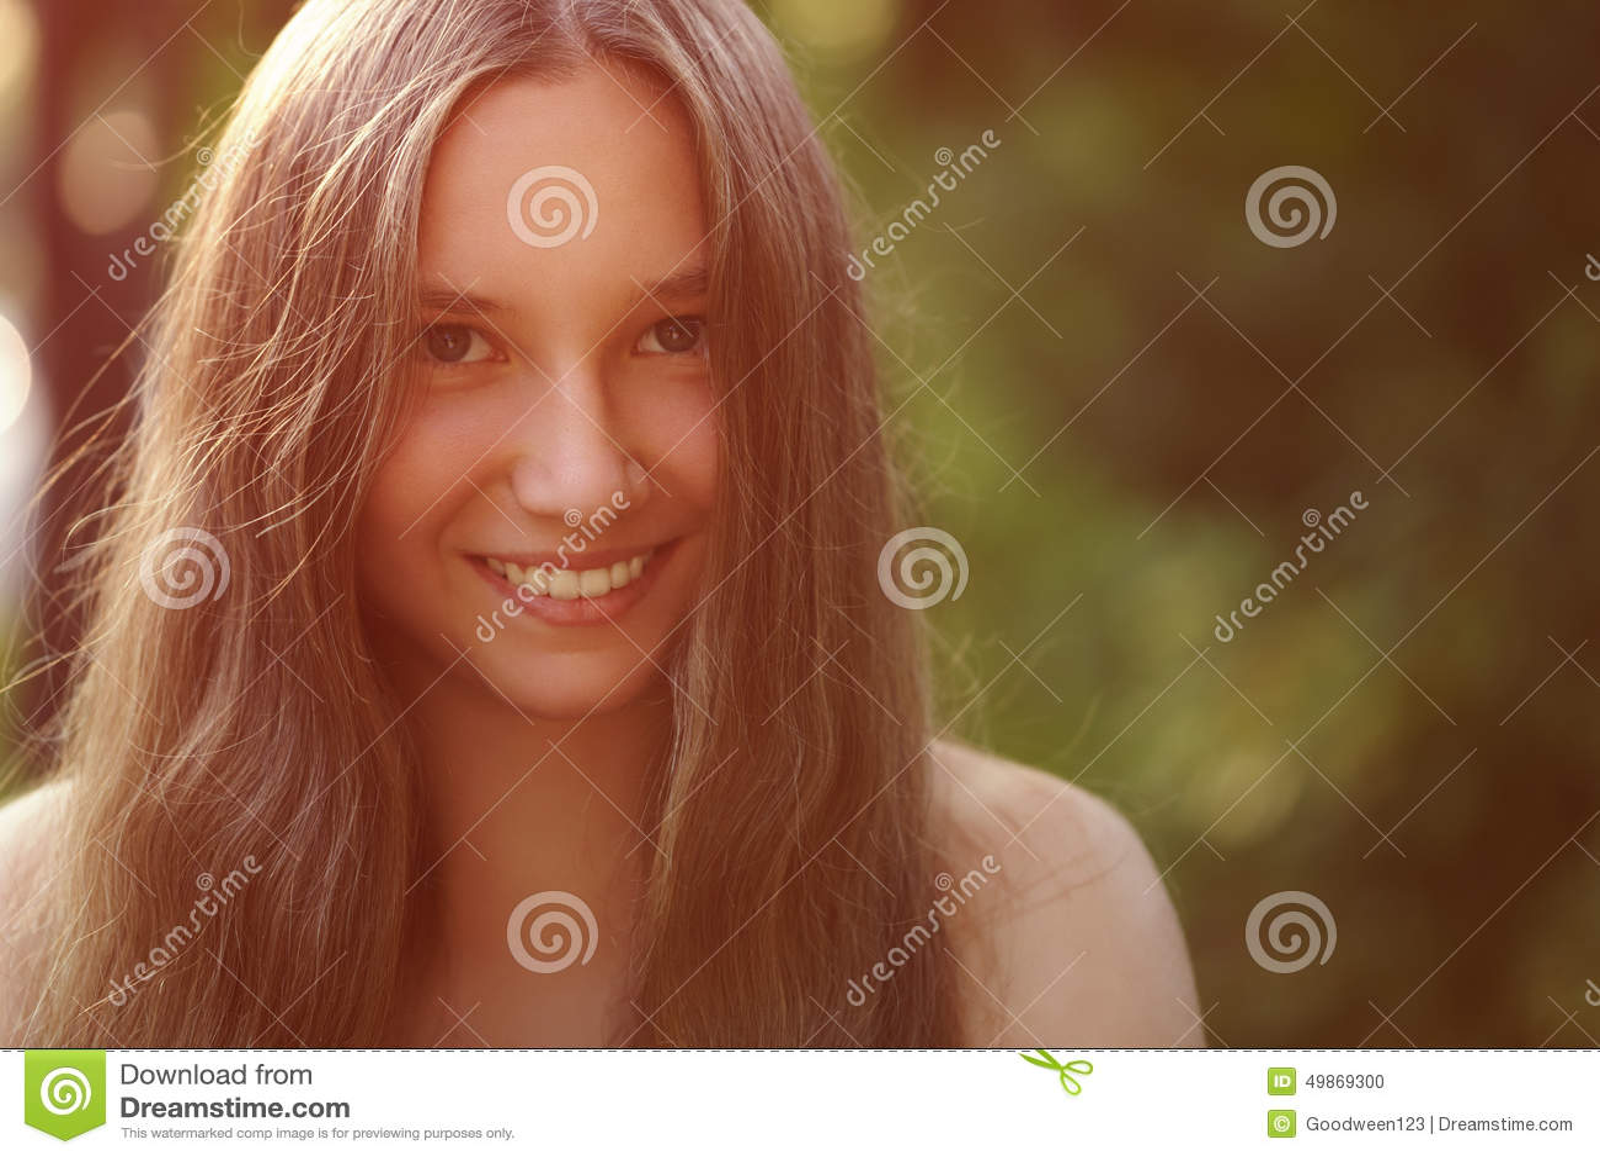 amateur naked sex close up